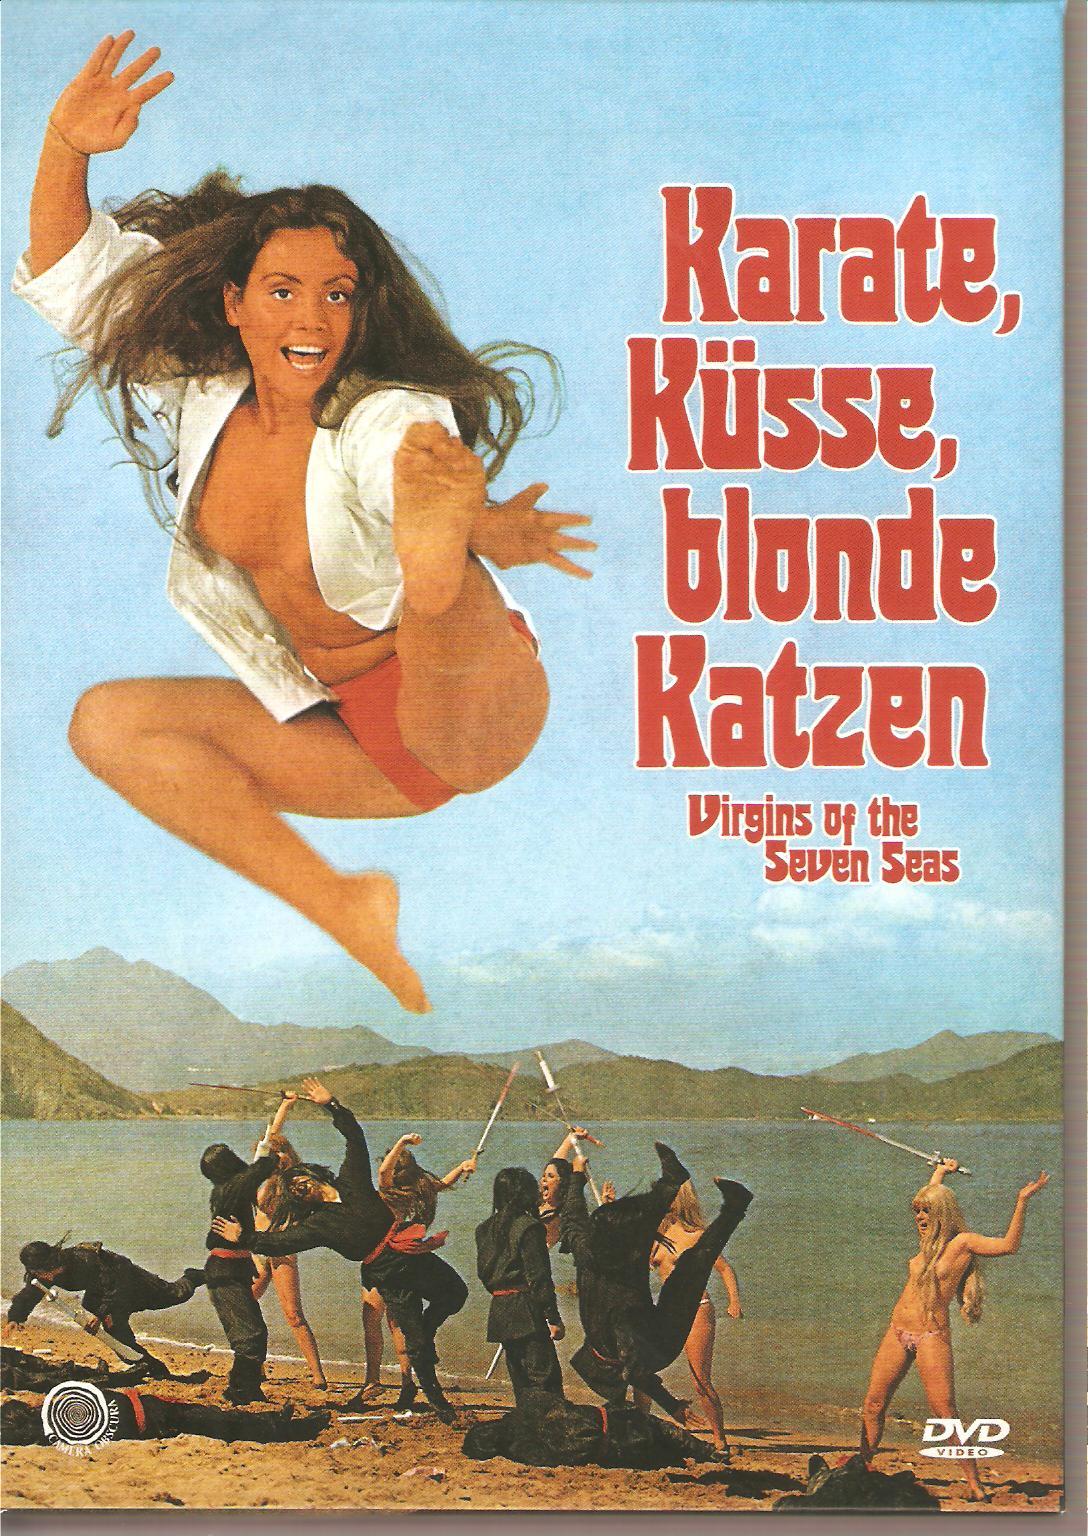 dansk hardcore porno gammel kusse